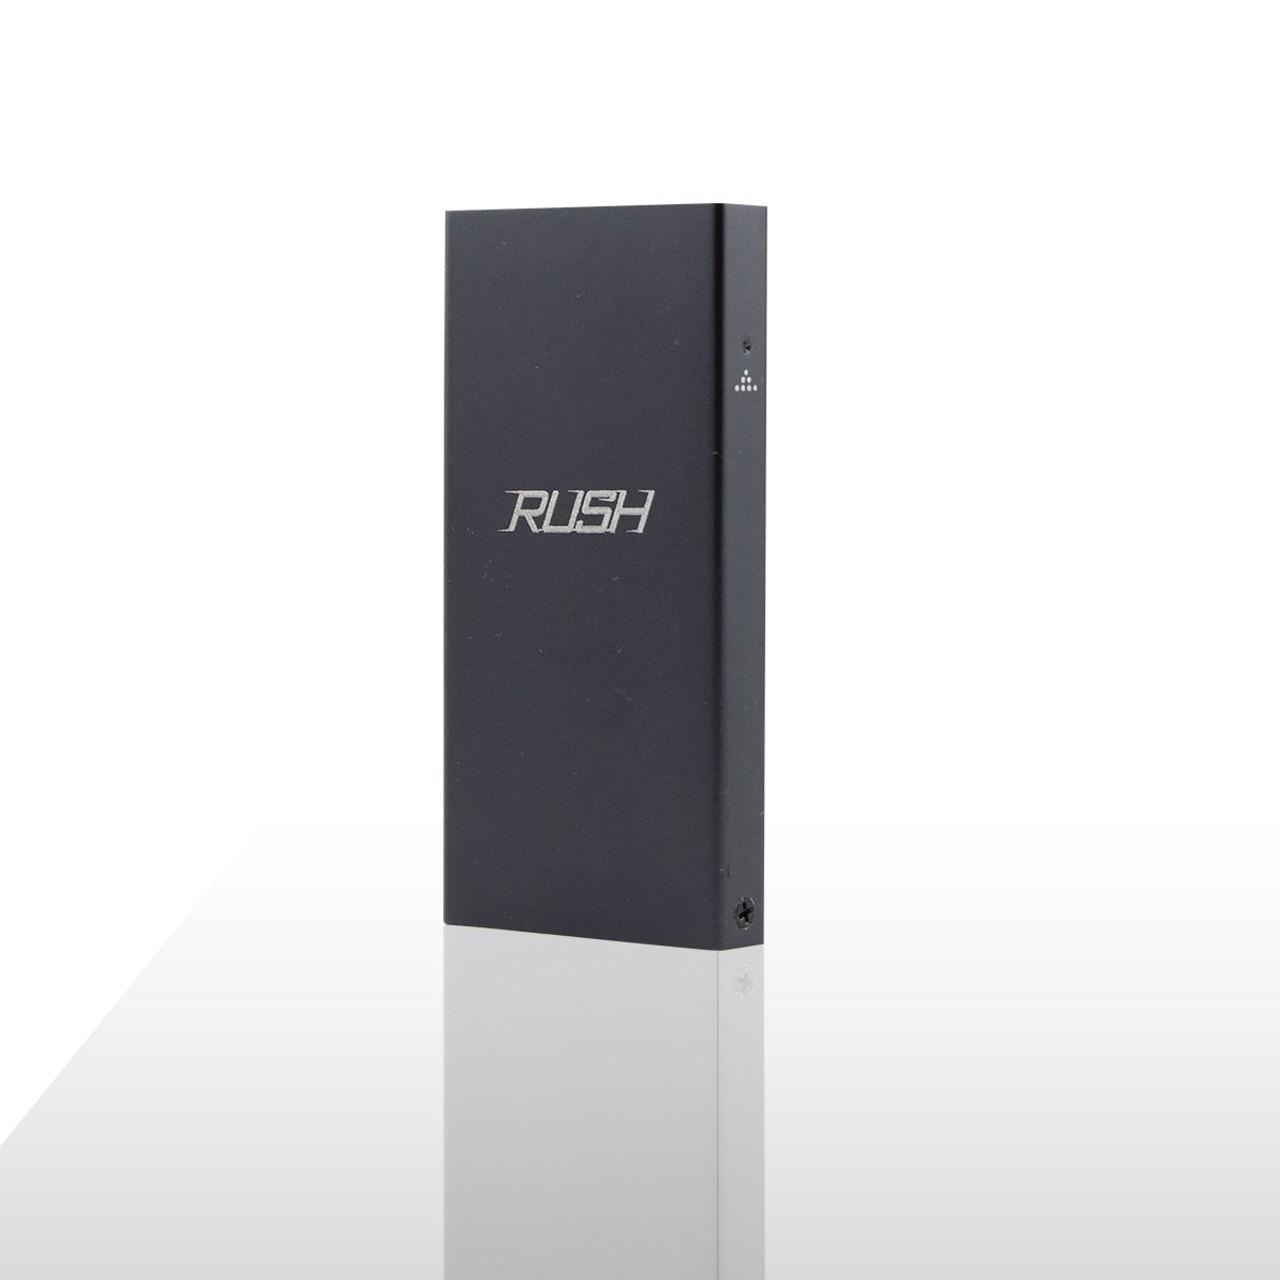 RUSH Device